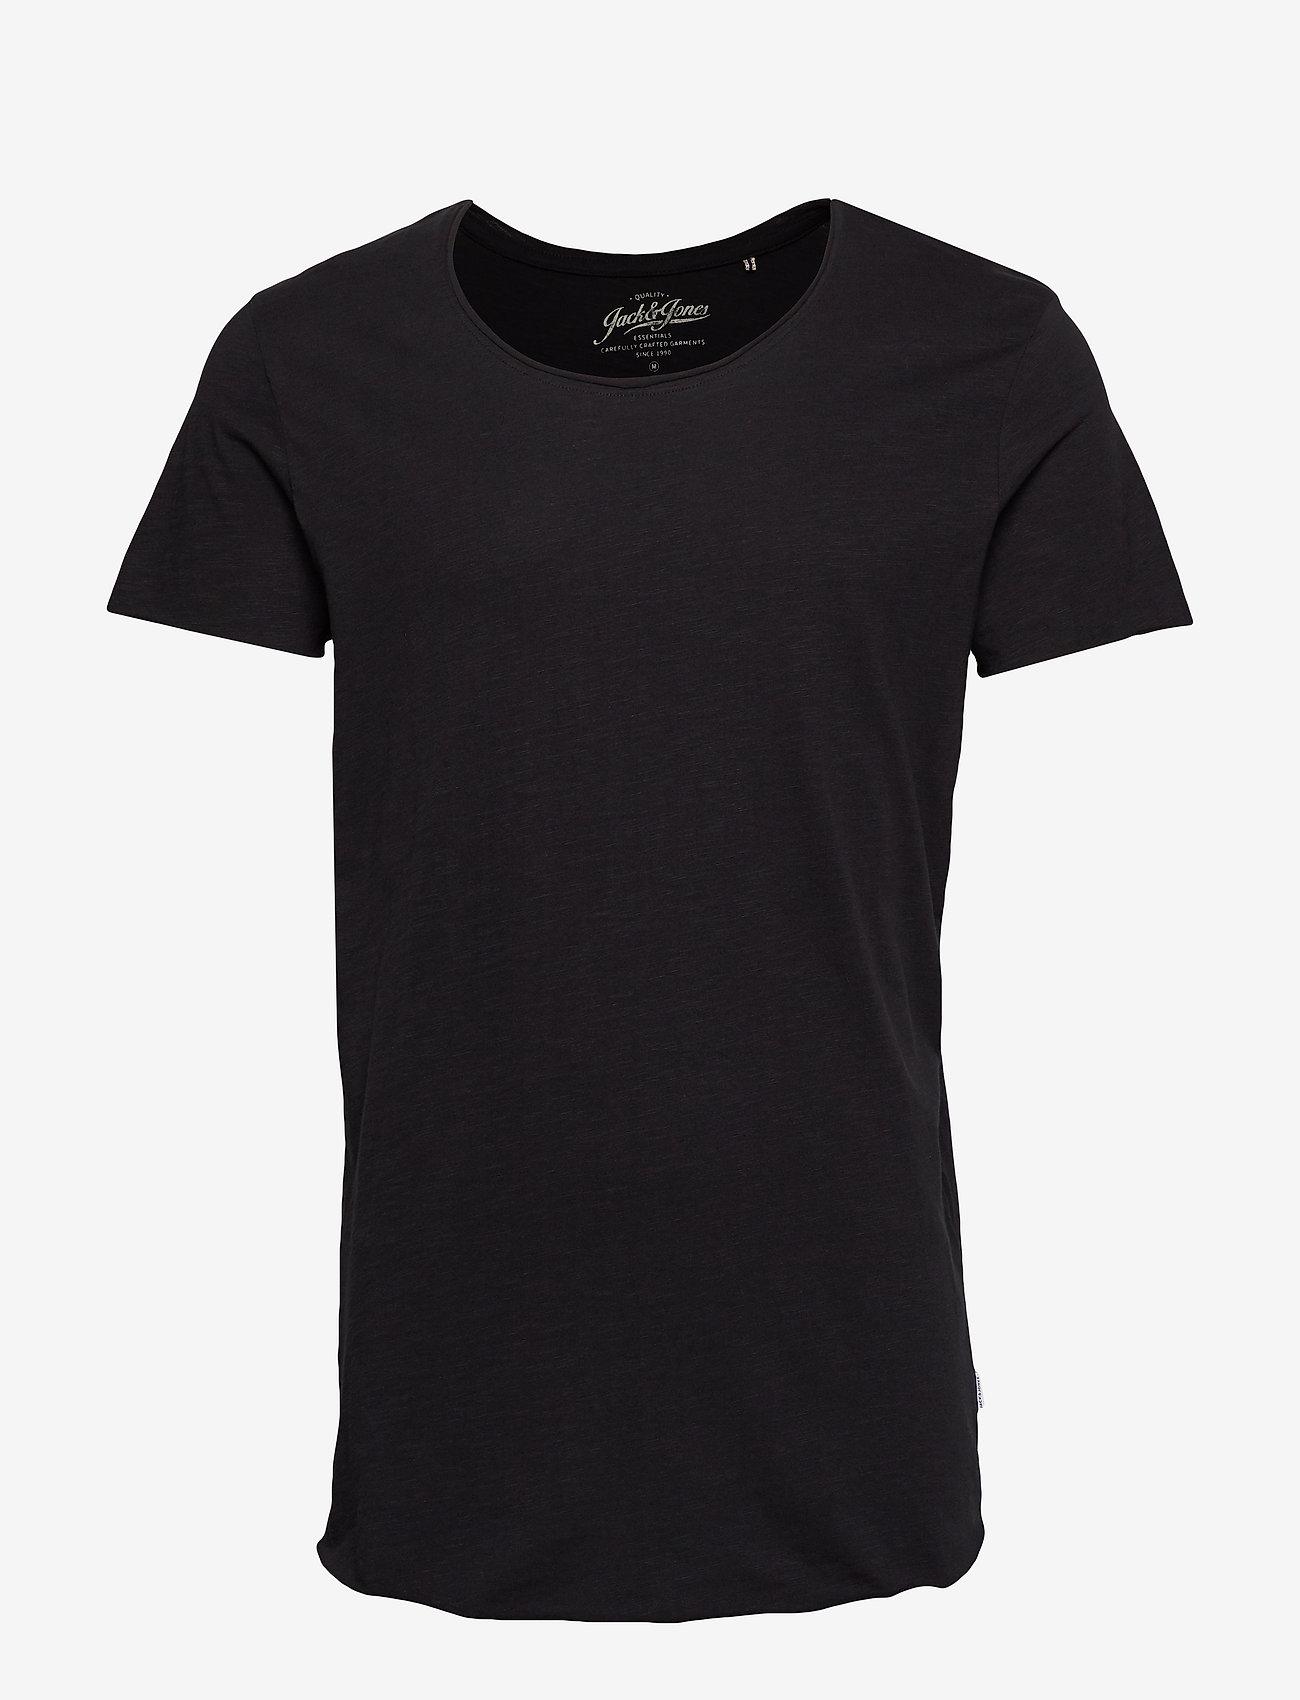 Jack & Jones - JJEBAS TEE SS U-NECK NOOS - basic t-shirts - black - 0